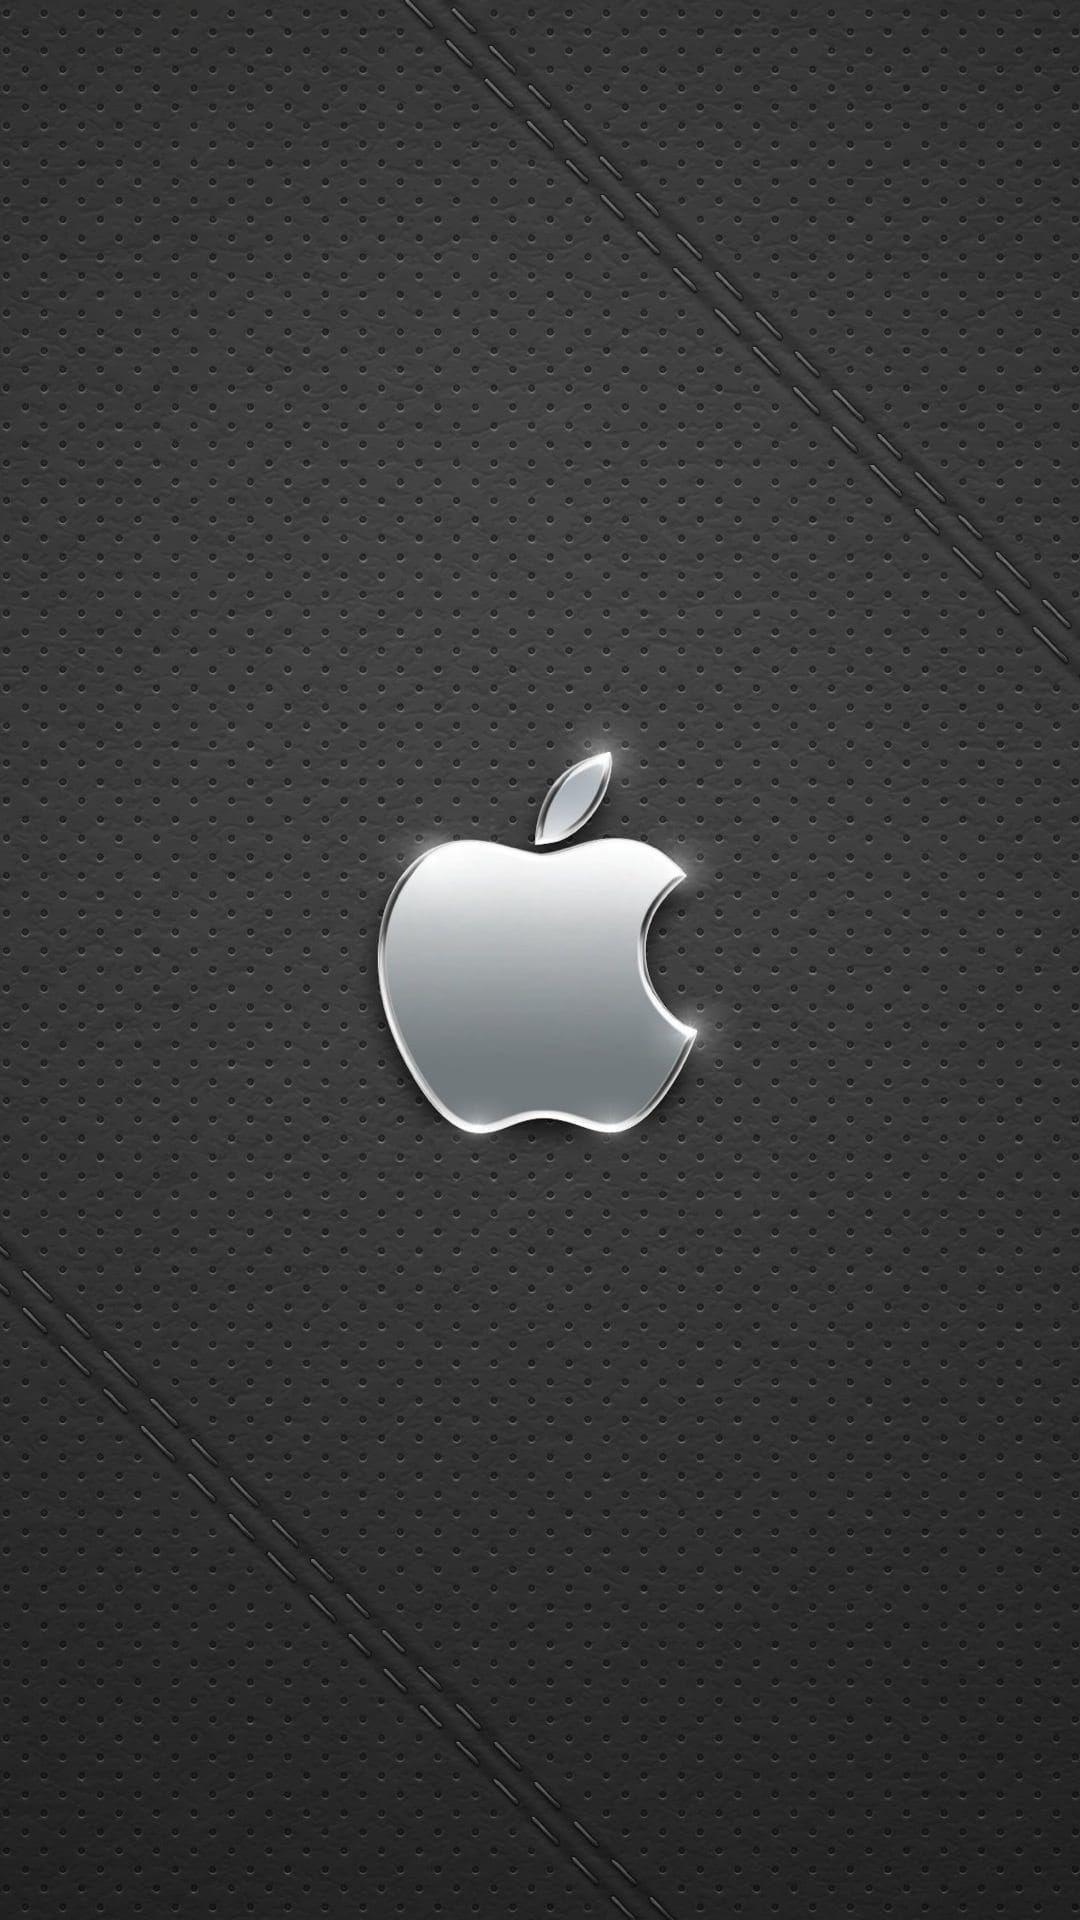 Logo iPhone 6 wallpaper